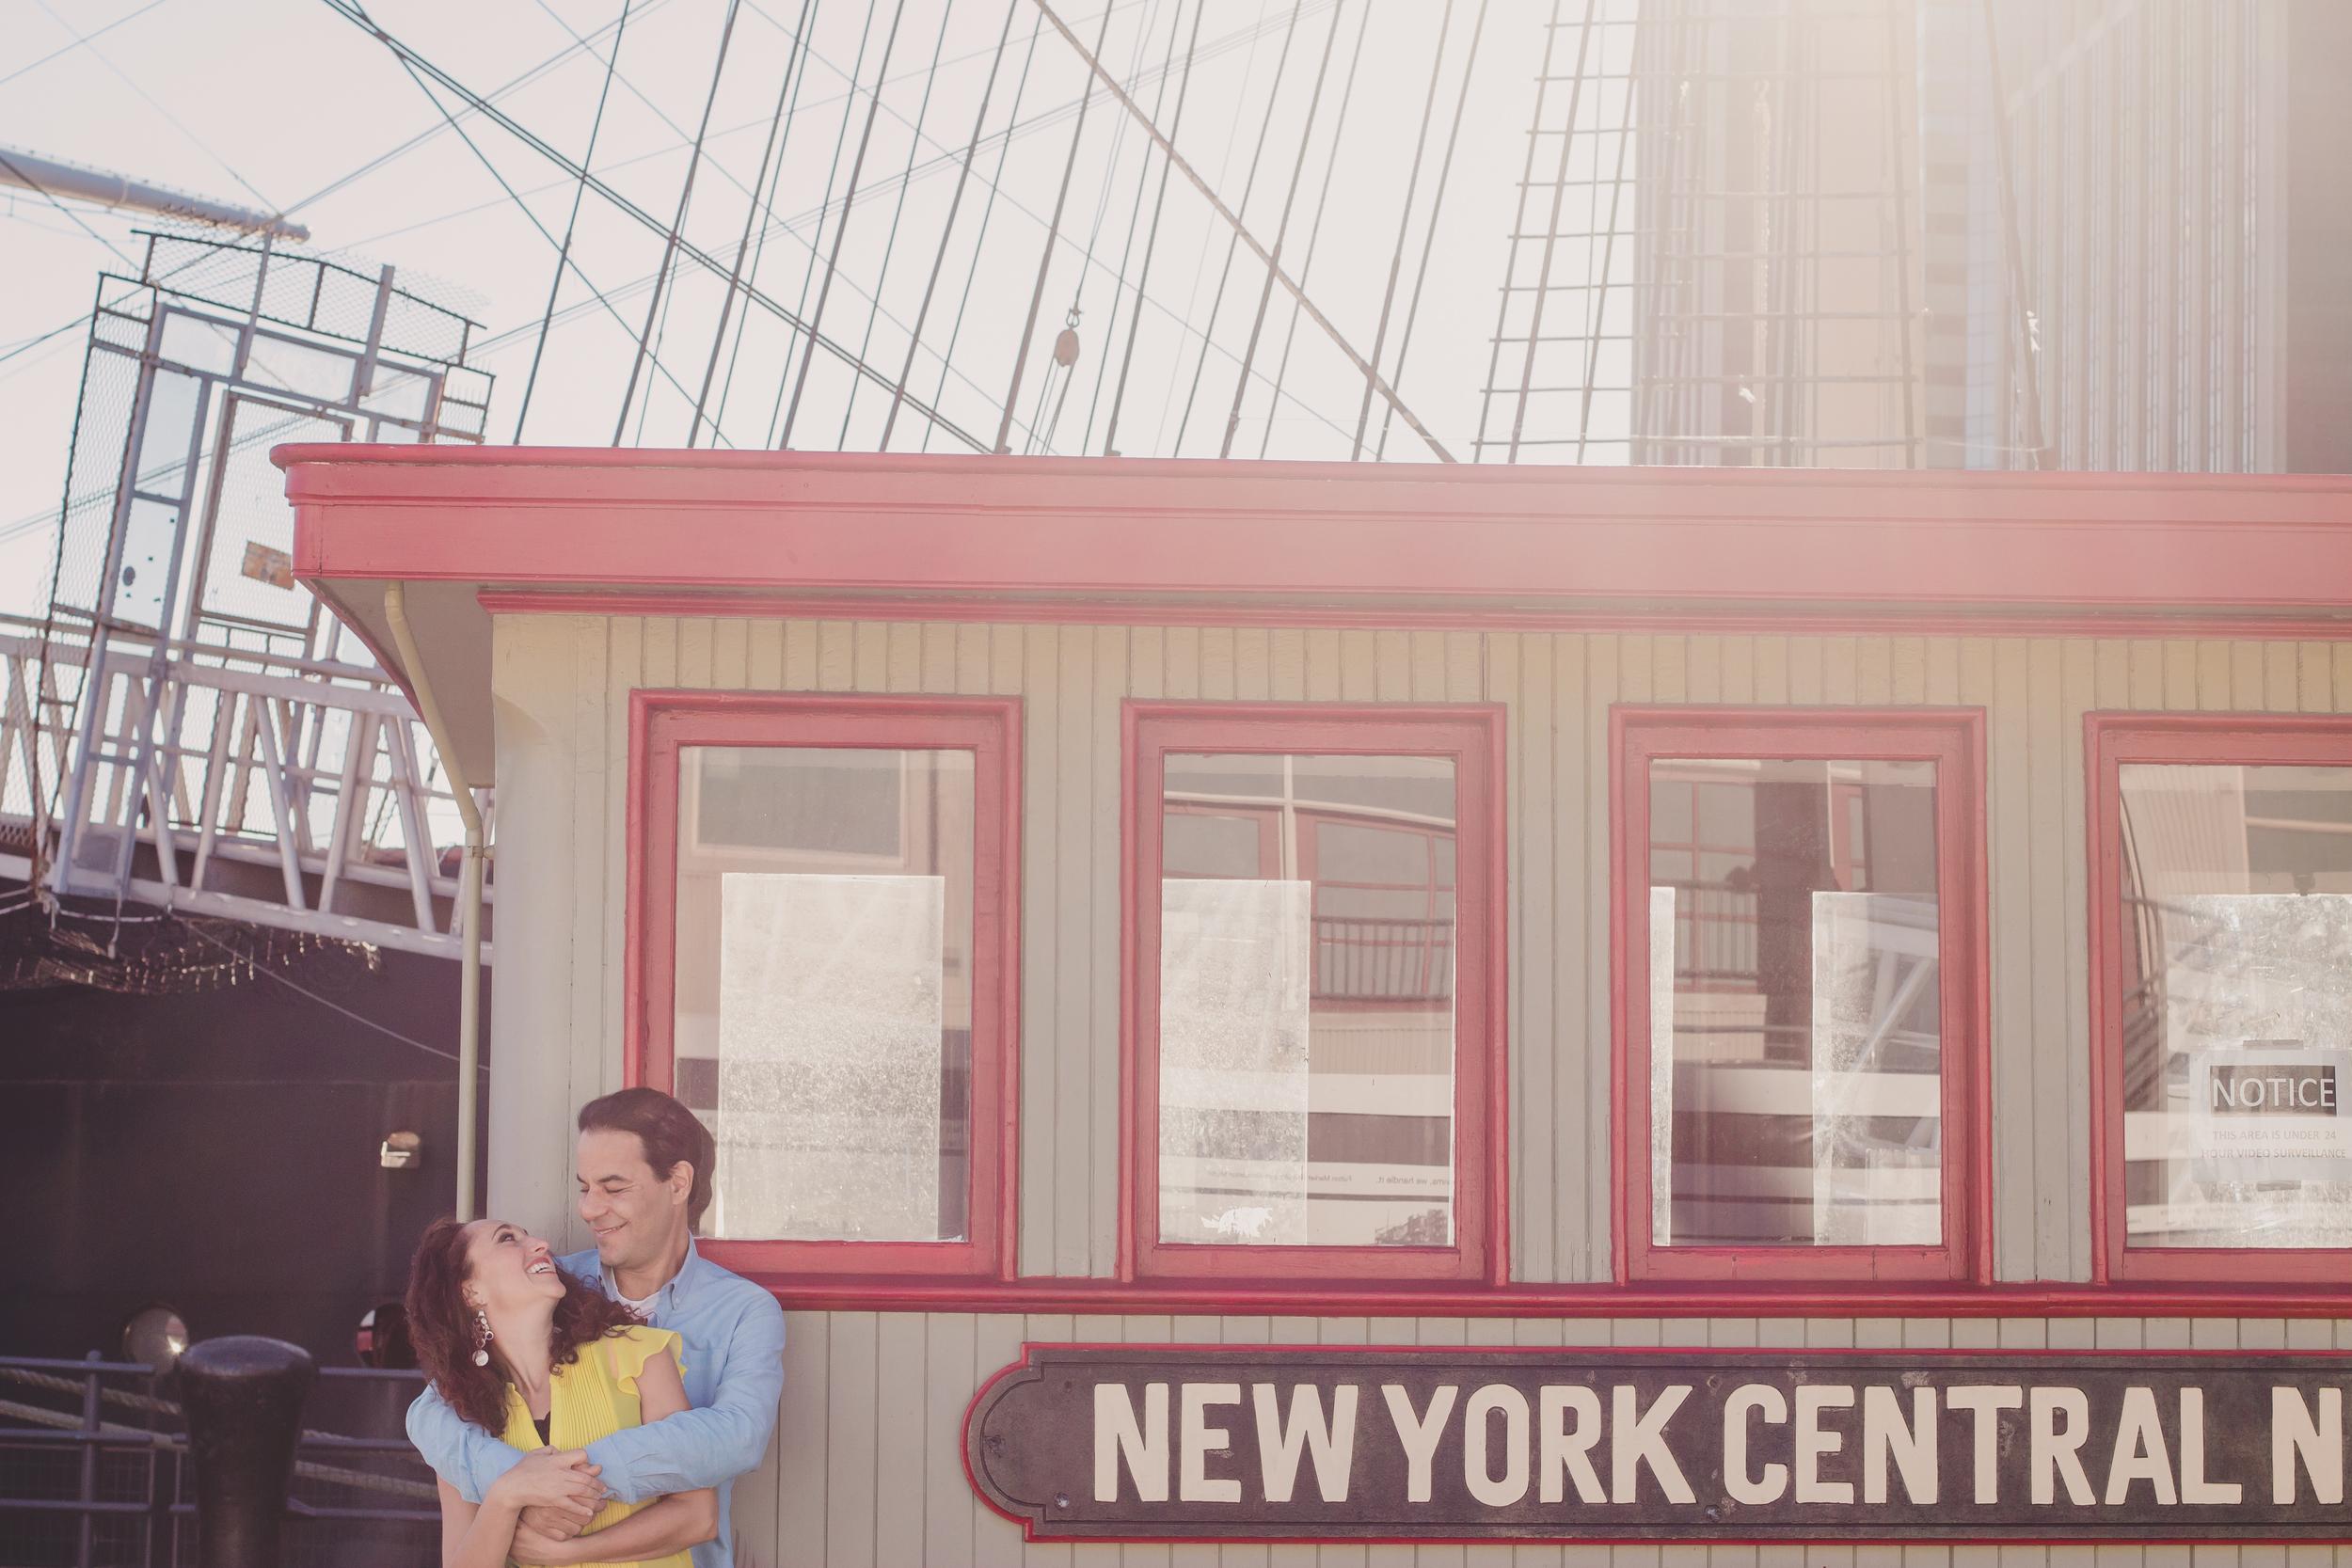 New York Central Train couple photos